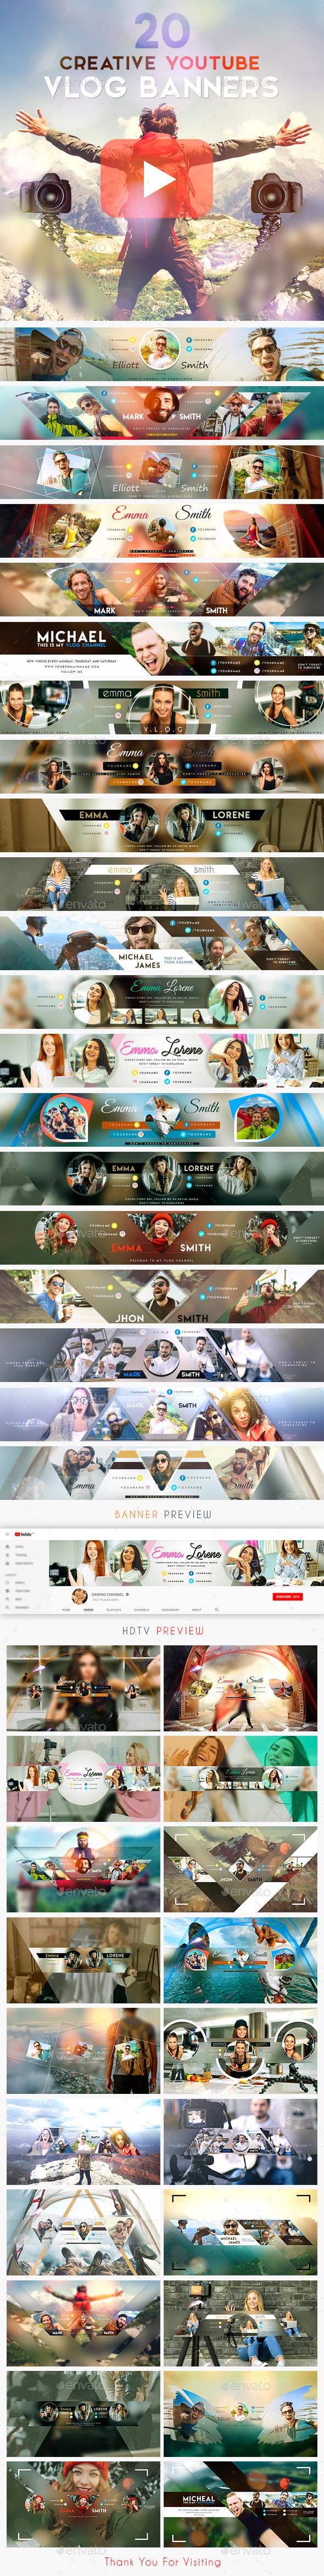 Vlog Bundle - 20 Creative YouTube Vlog Banners - YouTube Social Media